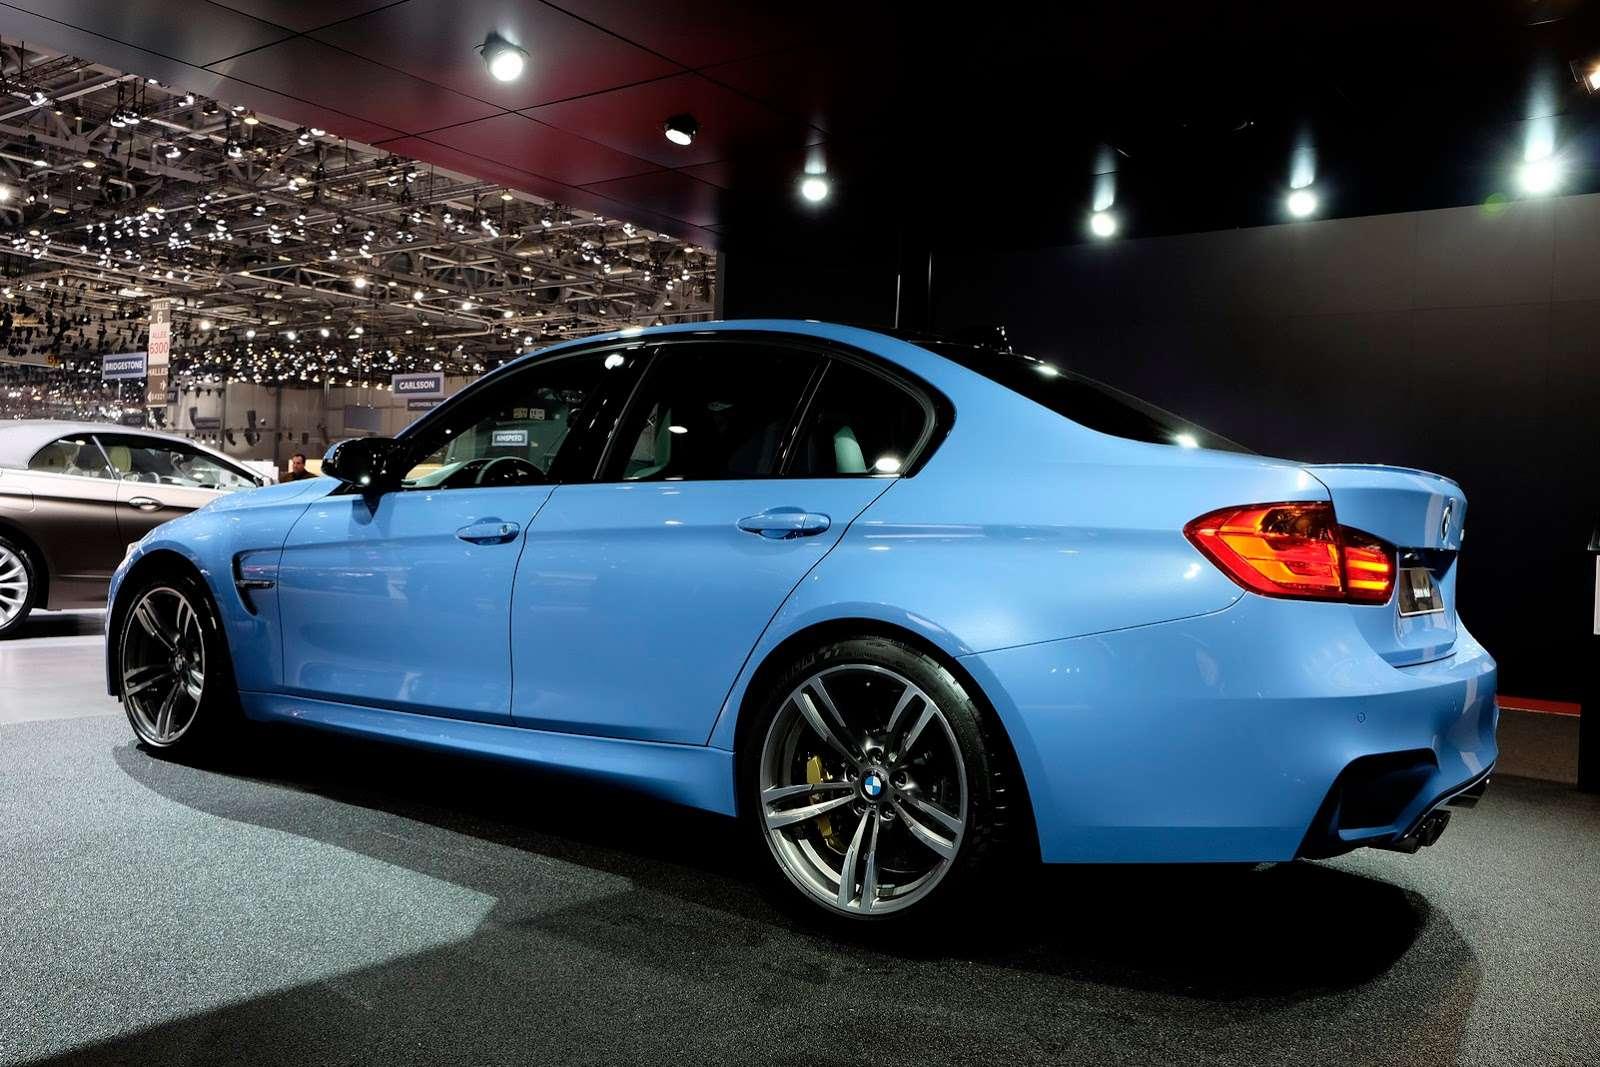 BMW m3 geneva 2014